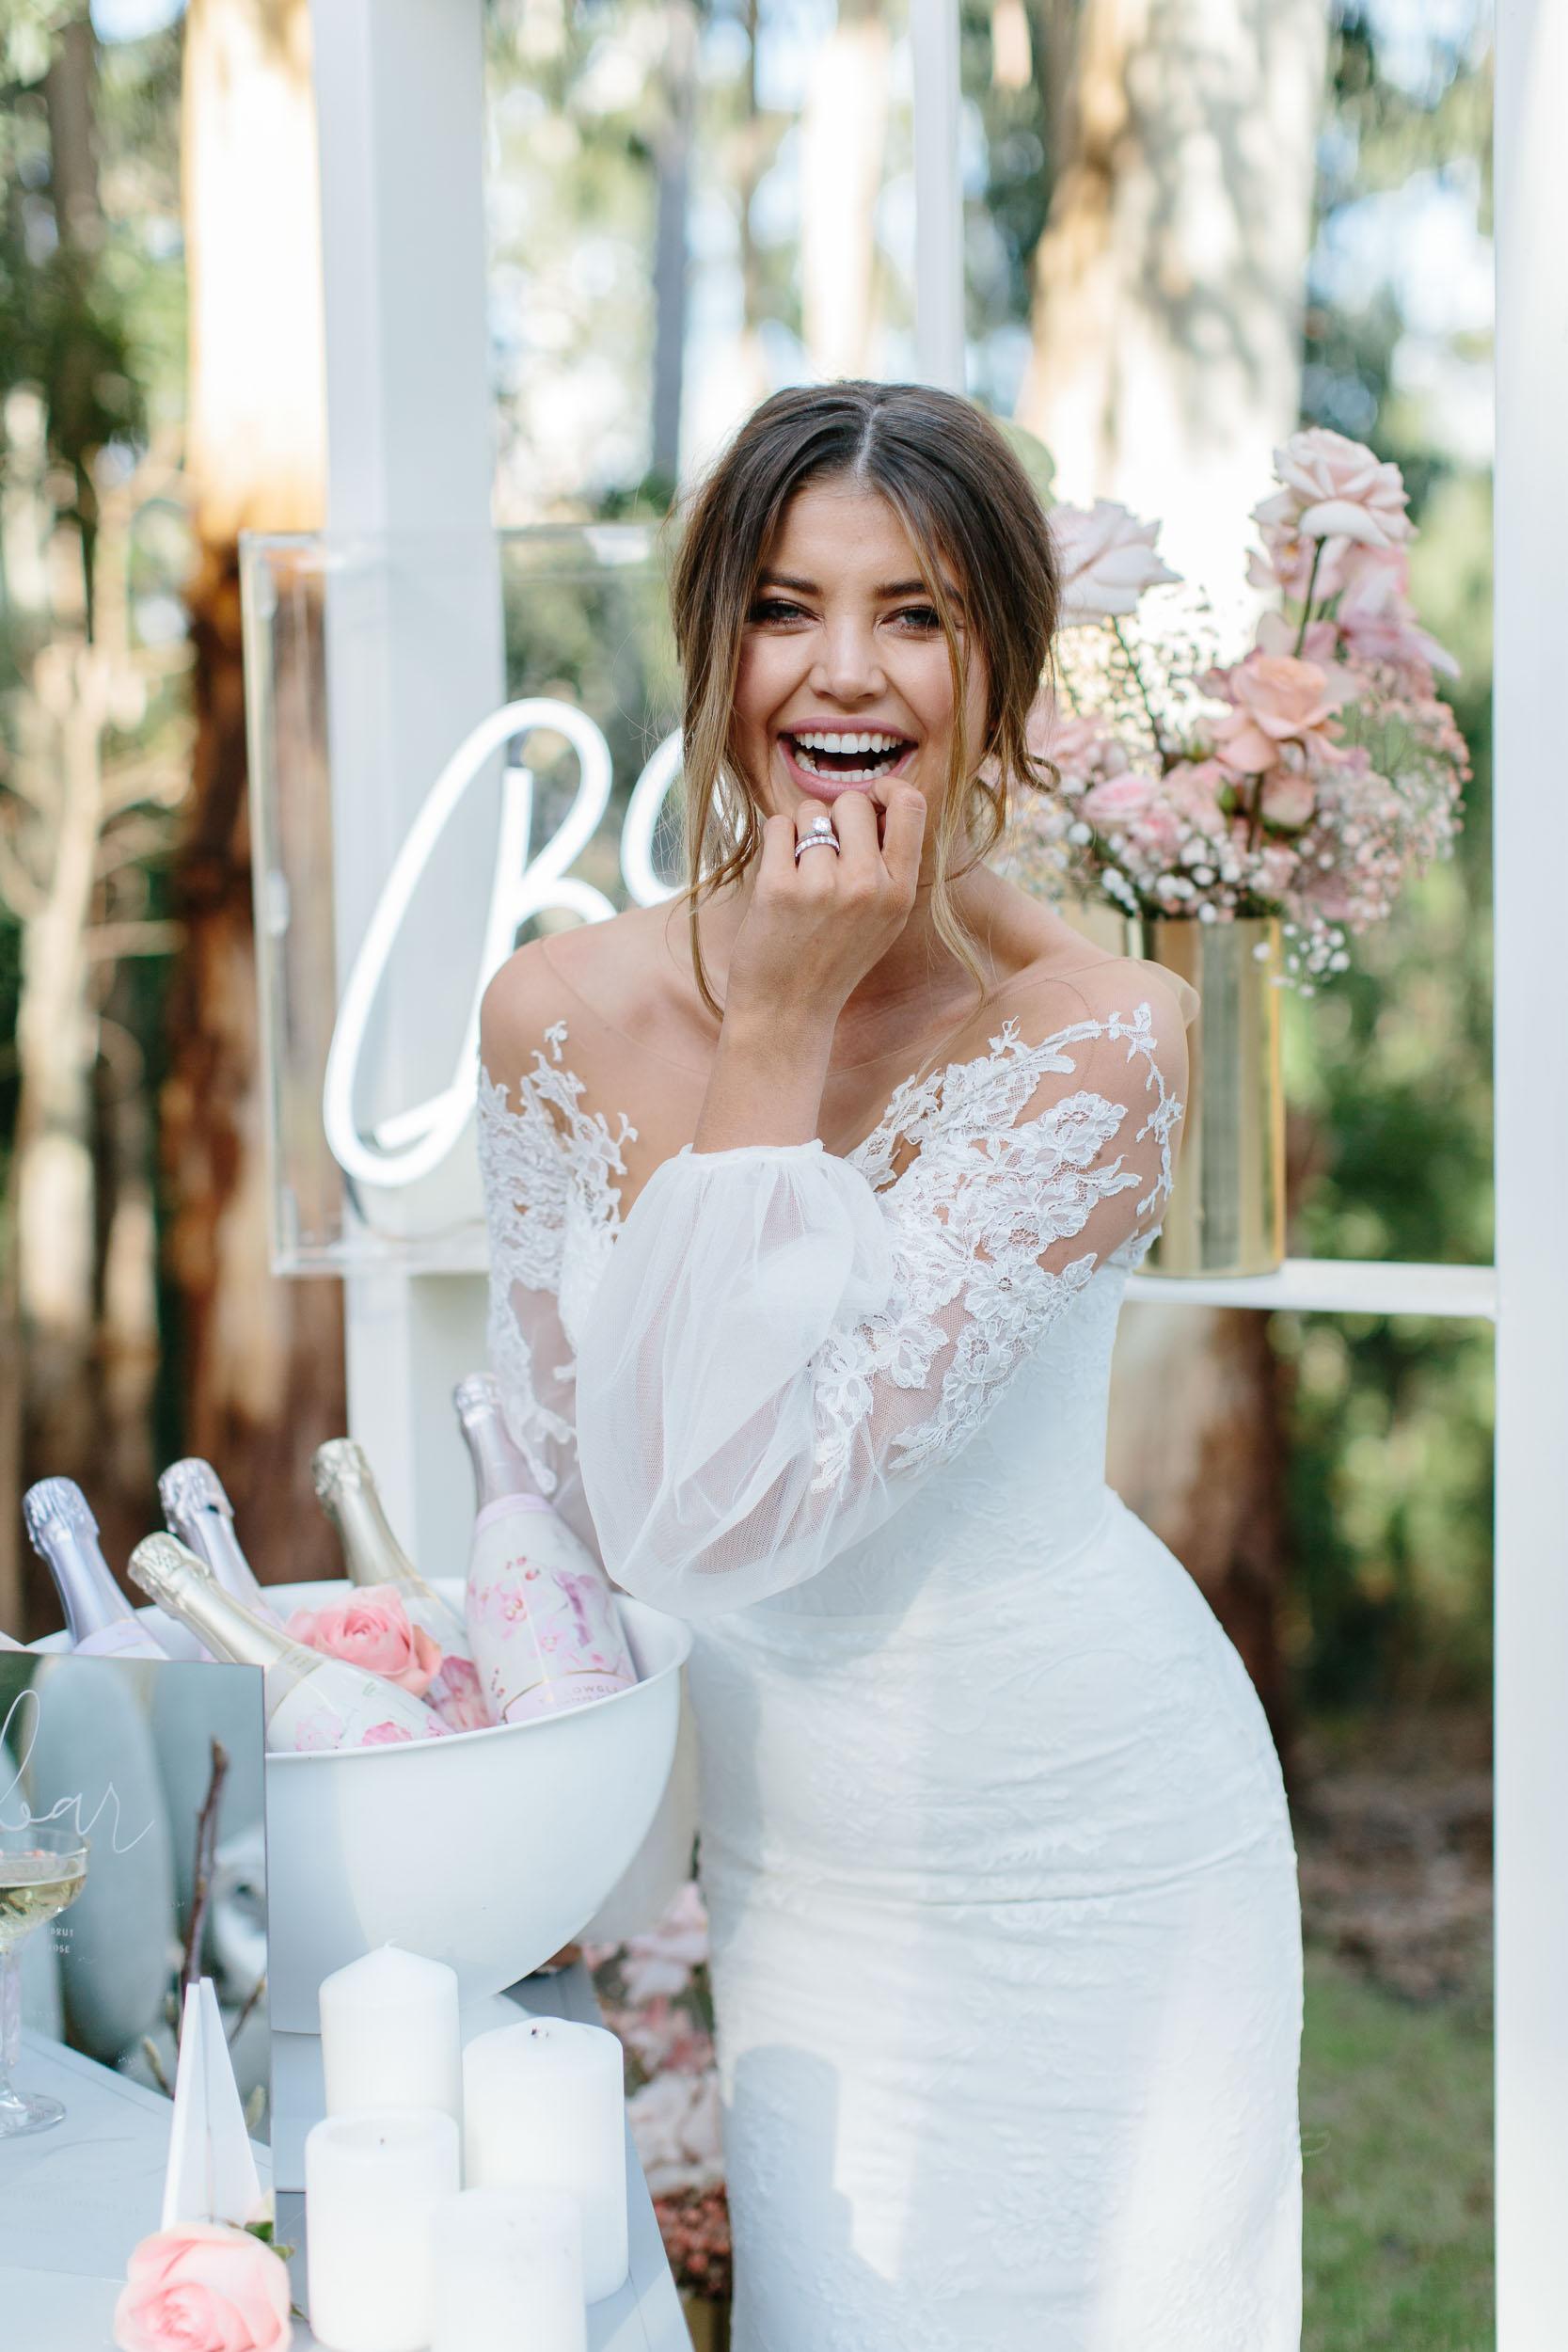 Kas-Richards-LENZO-Yarra-Valley-Wedding-One-Day-Bridal-231.jpg